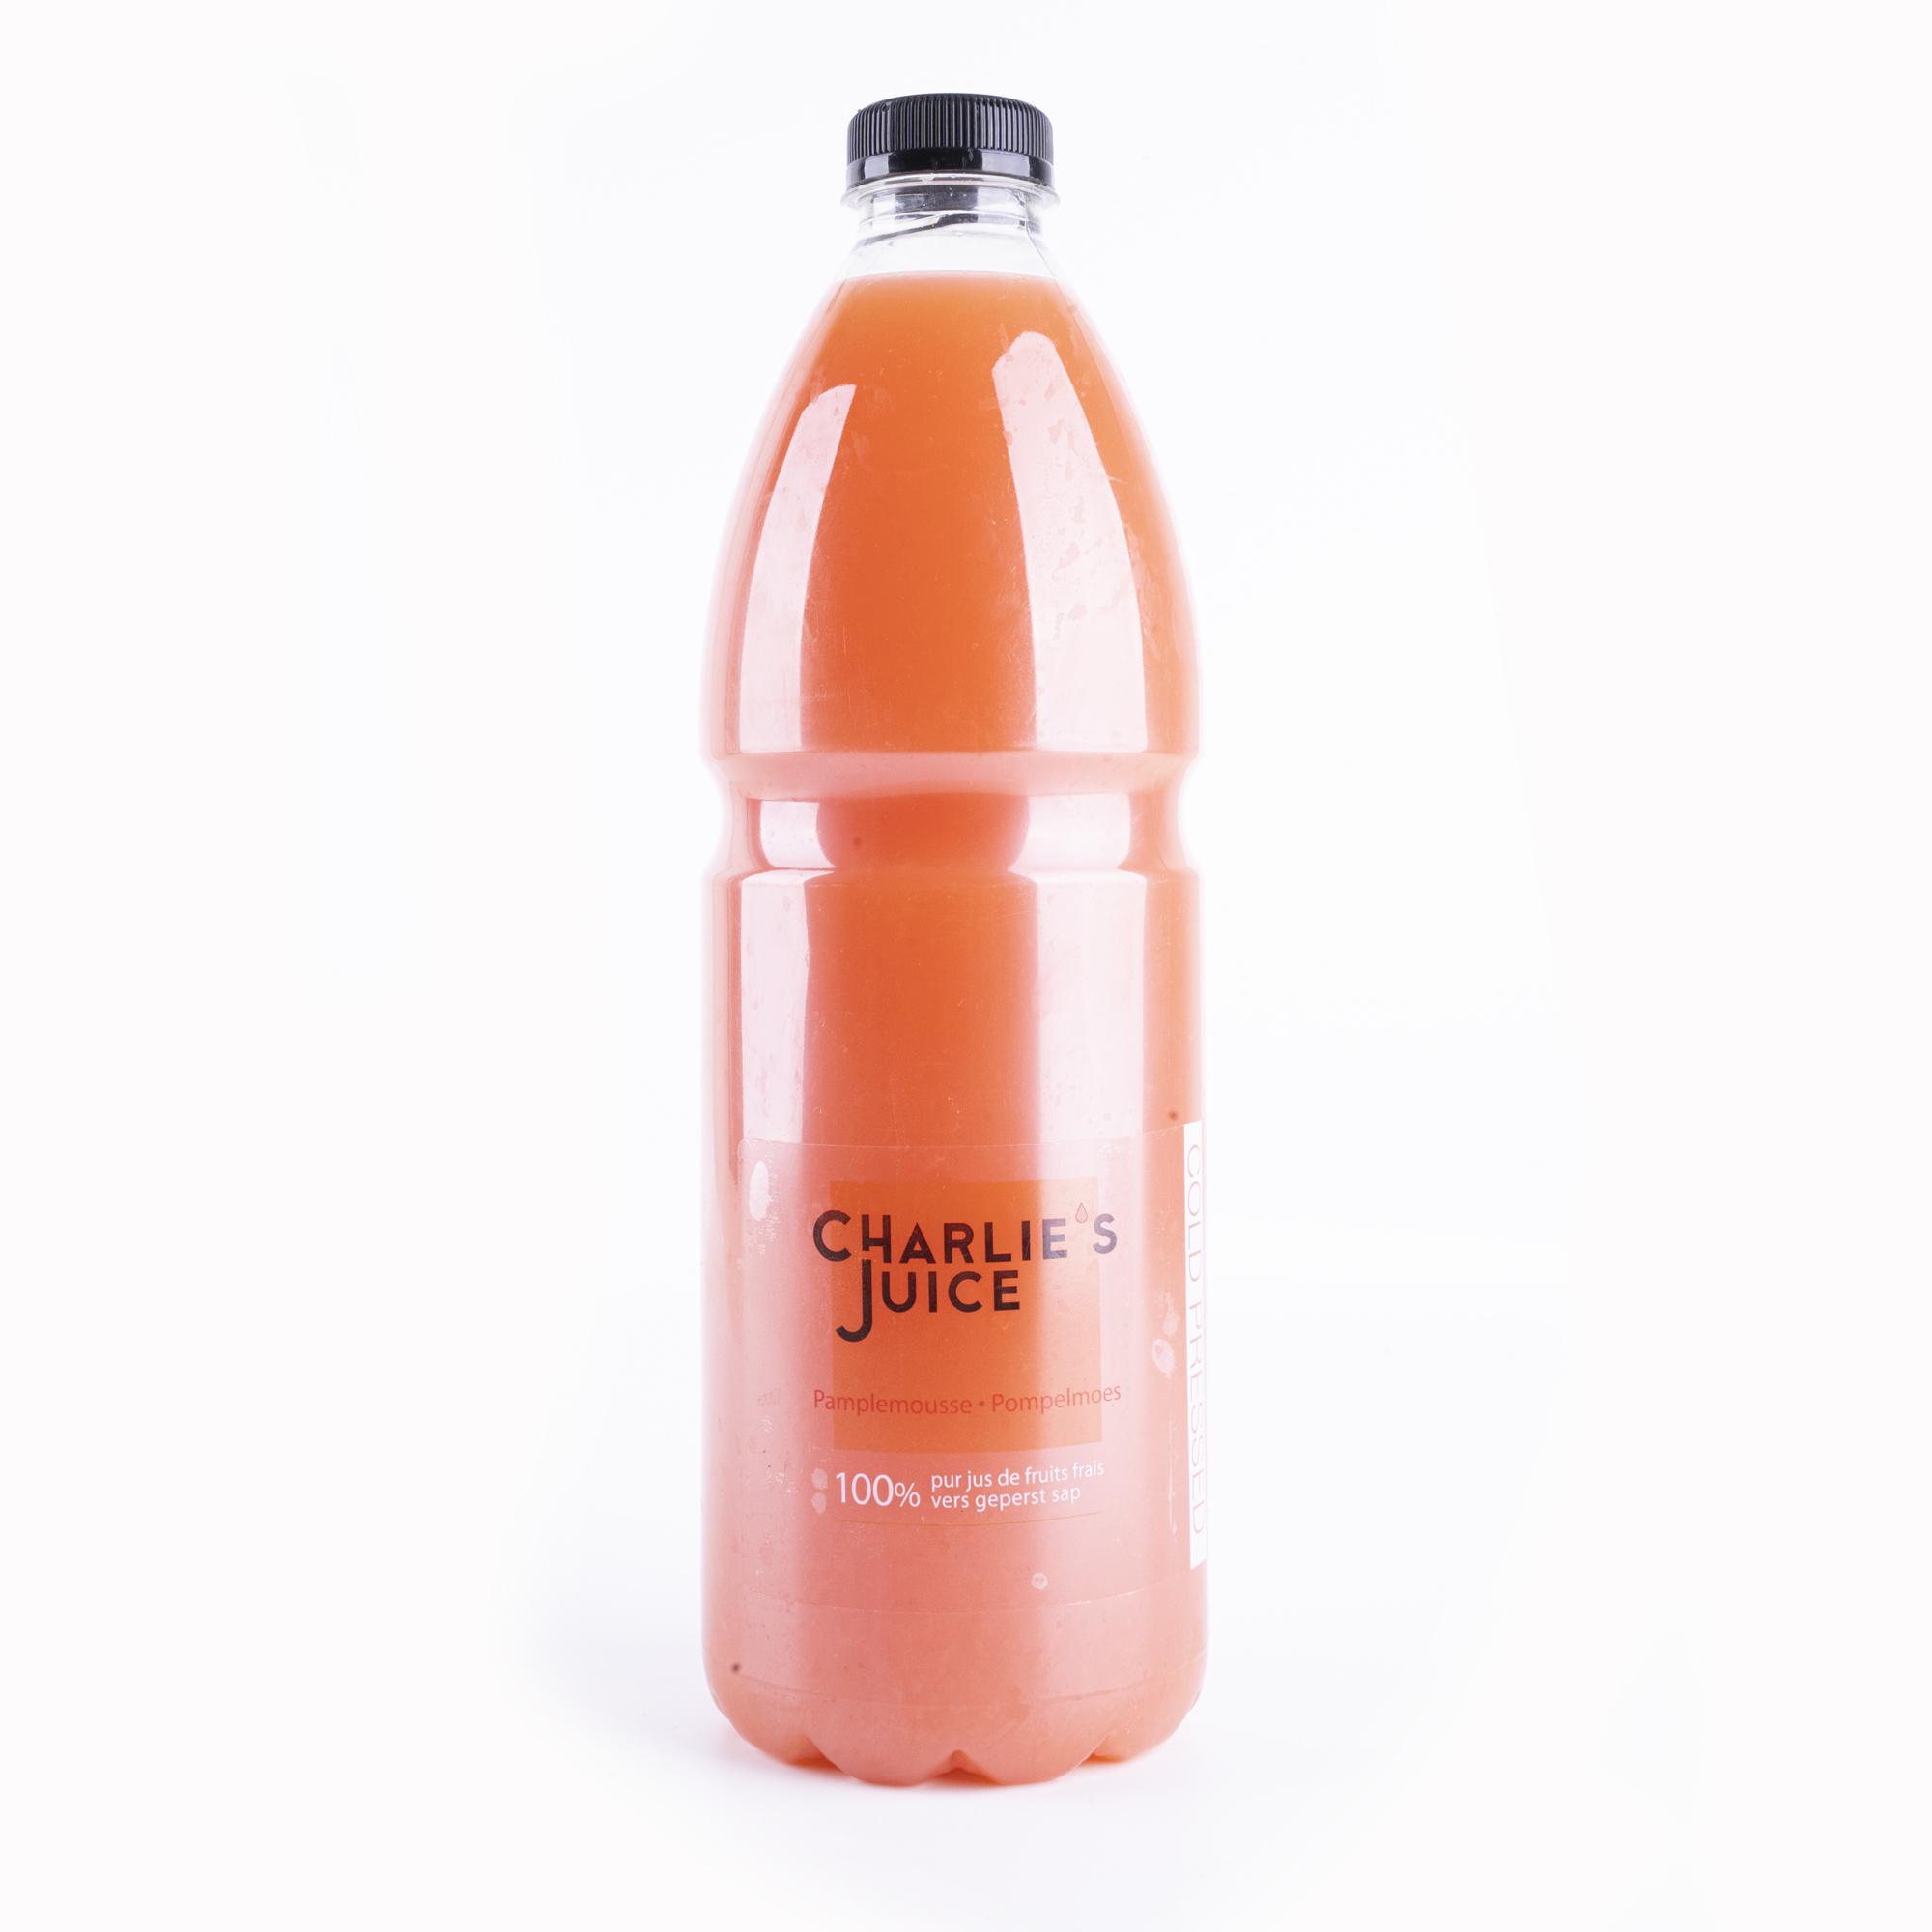 The Juicy Group - Charlie's Juice - Jus de multifruits - HPP Pure 2L.